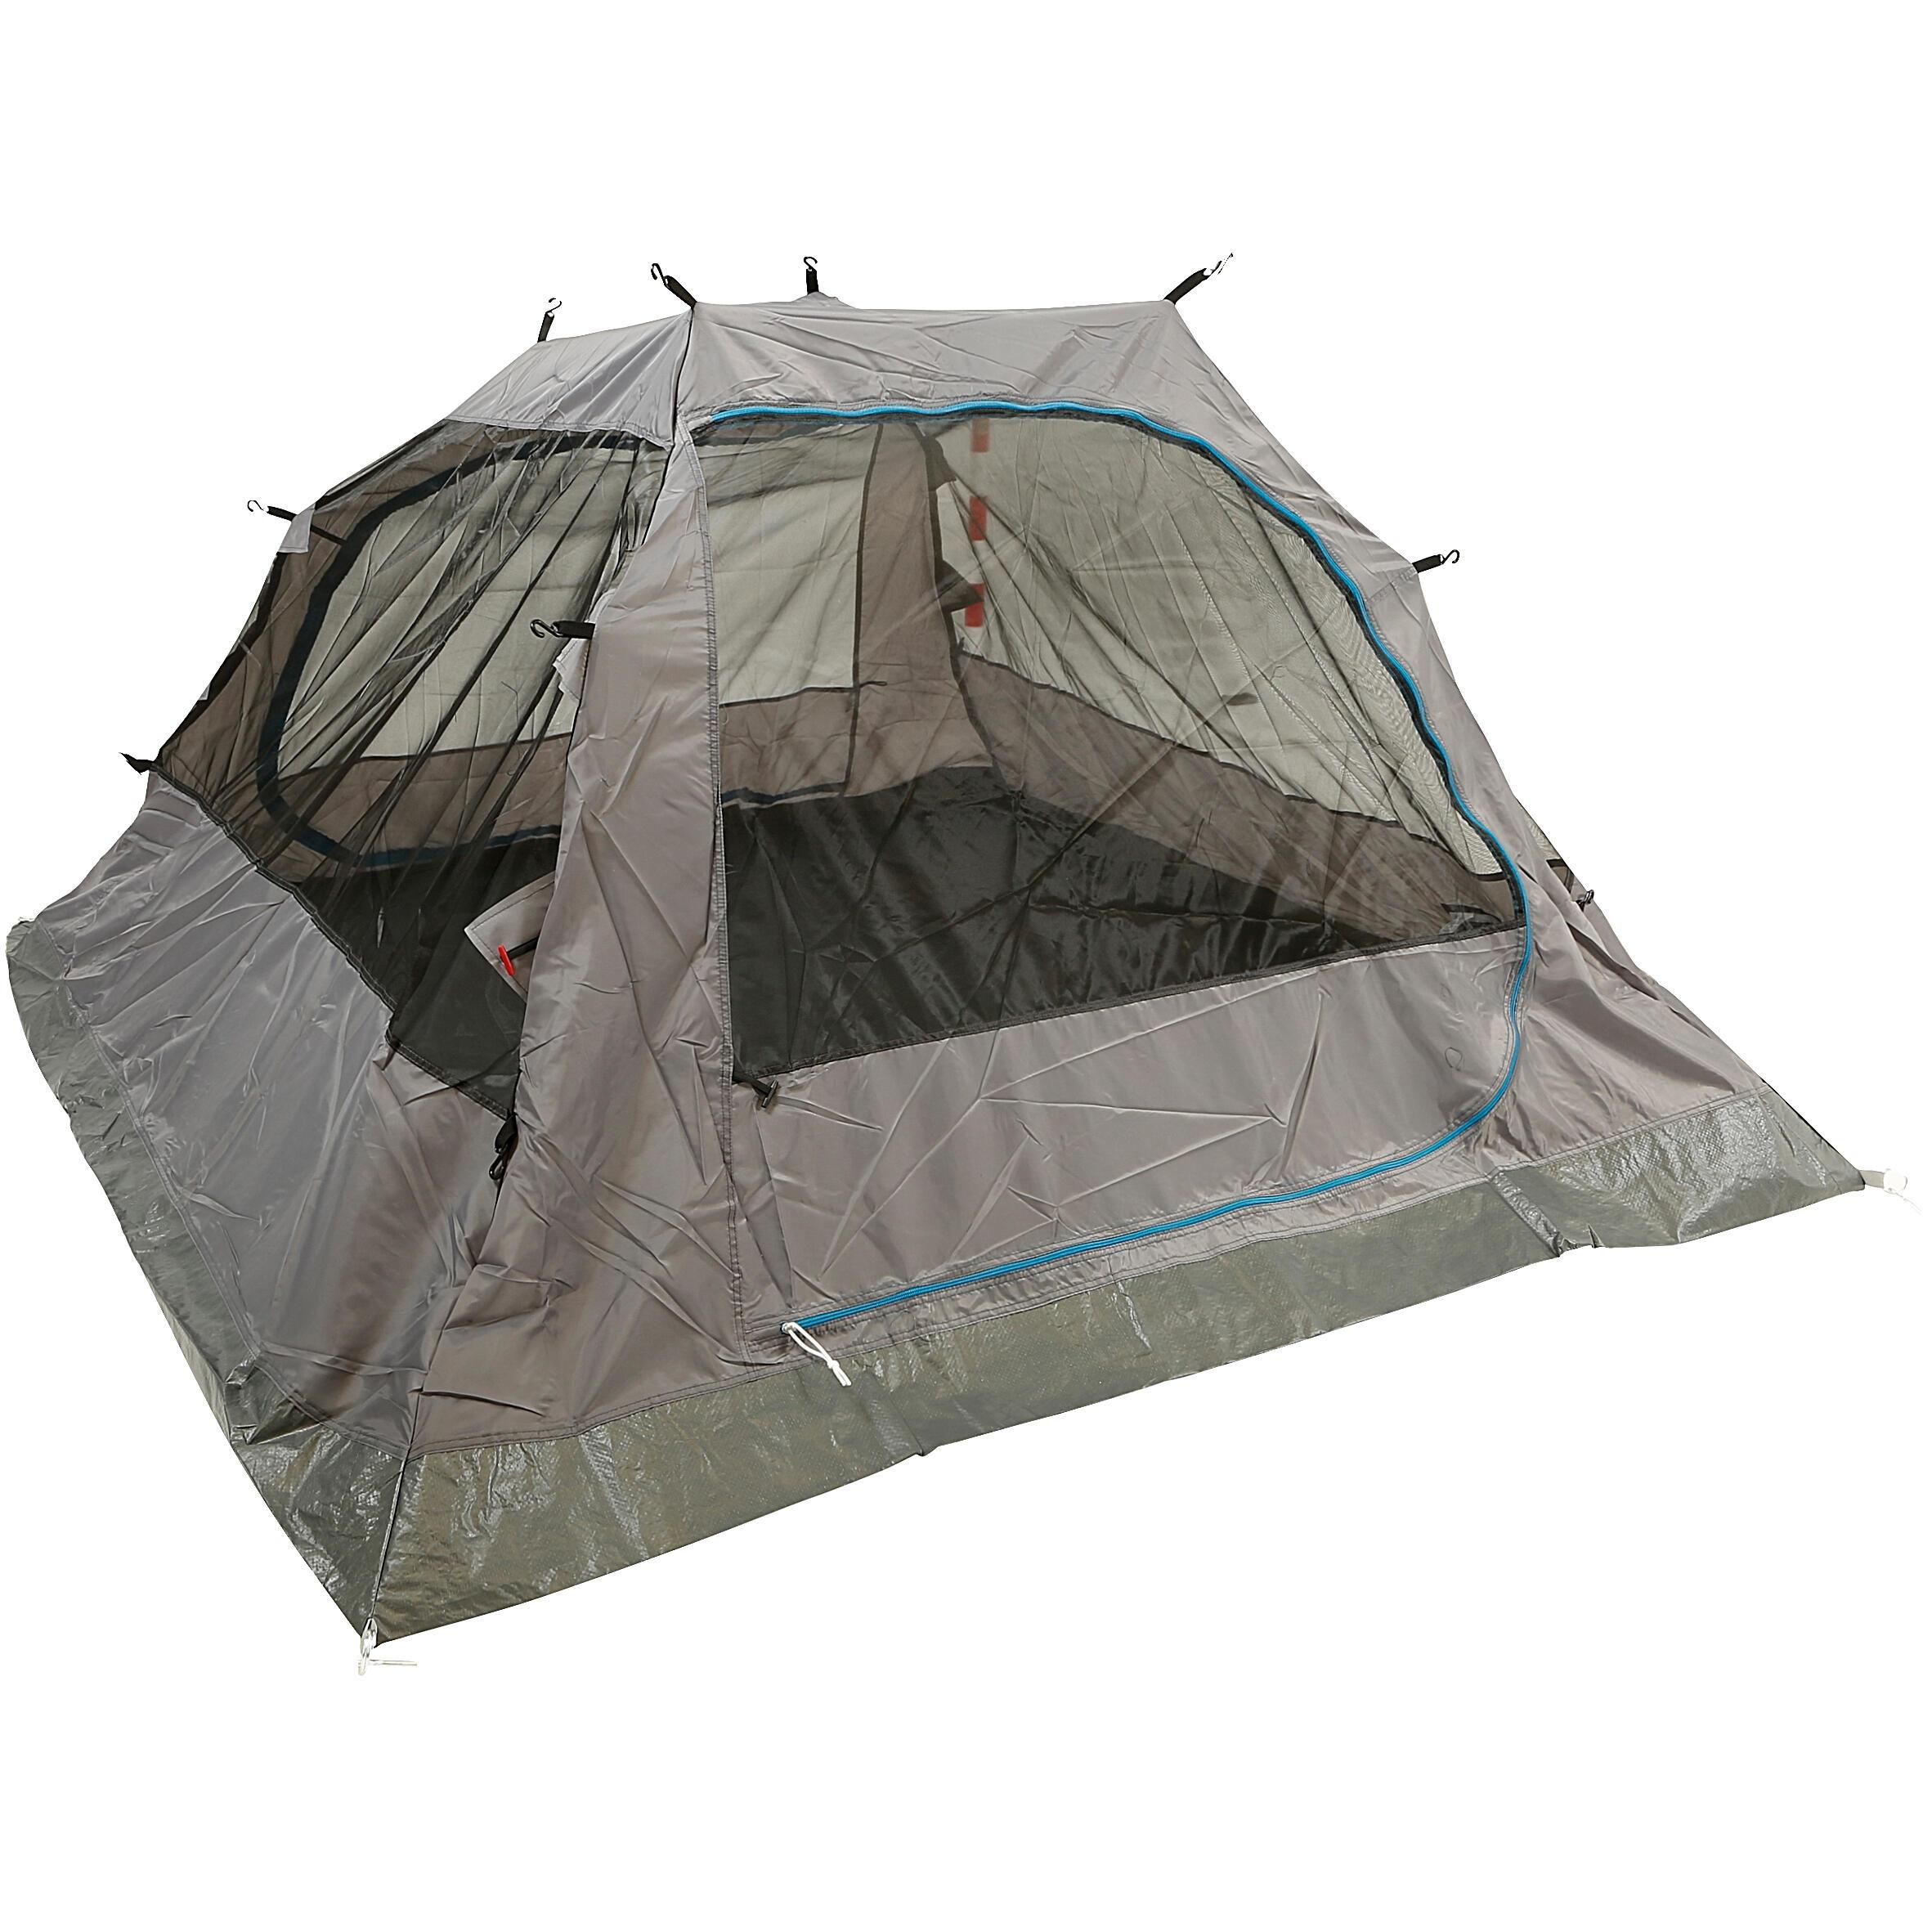 Quechua Slaapcompartiment voor tent Arpenaz 3 Fresh